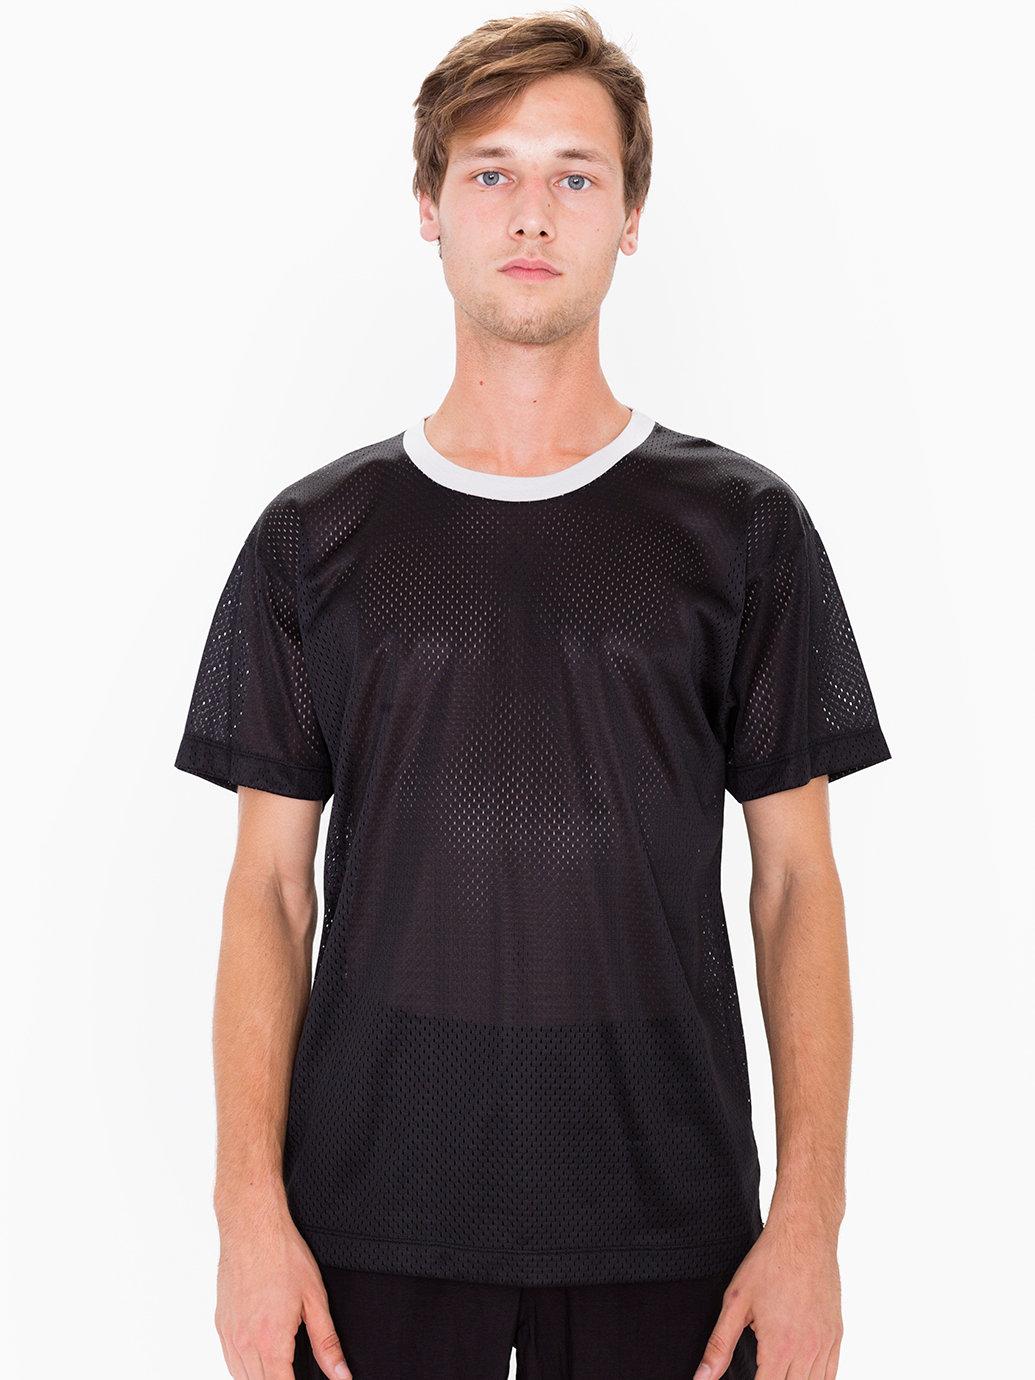 American apparel poly mesh athletic tee in multicolor for for American apparel mesh shirt